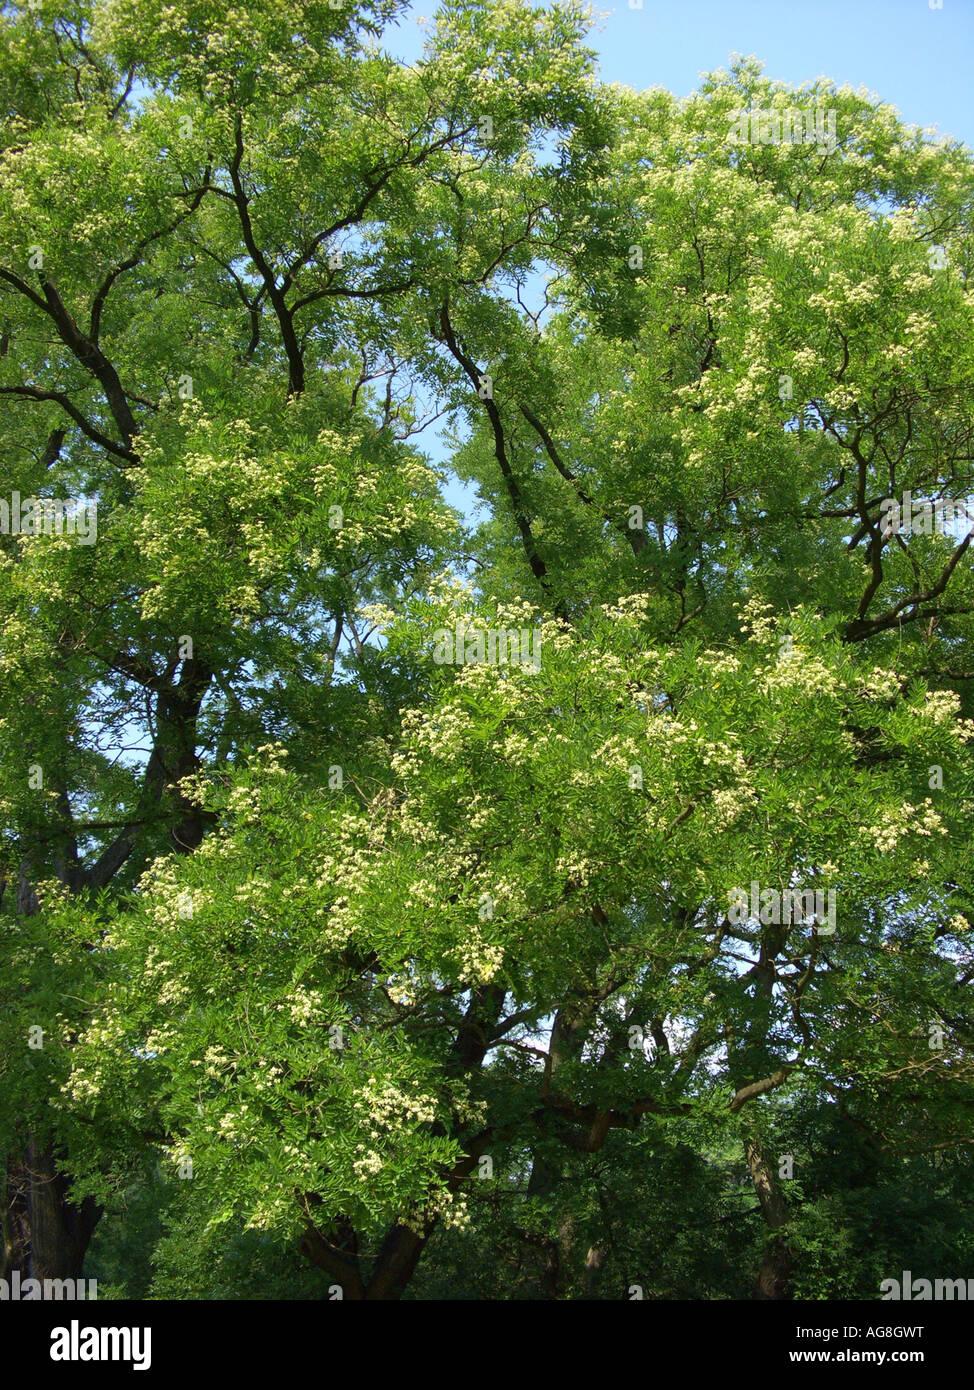 arbre pagode japonaise (sophora japonica), blooming banque d'images